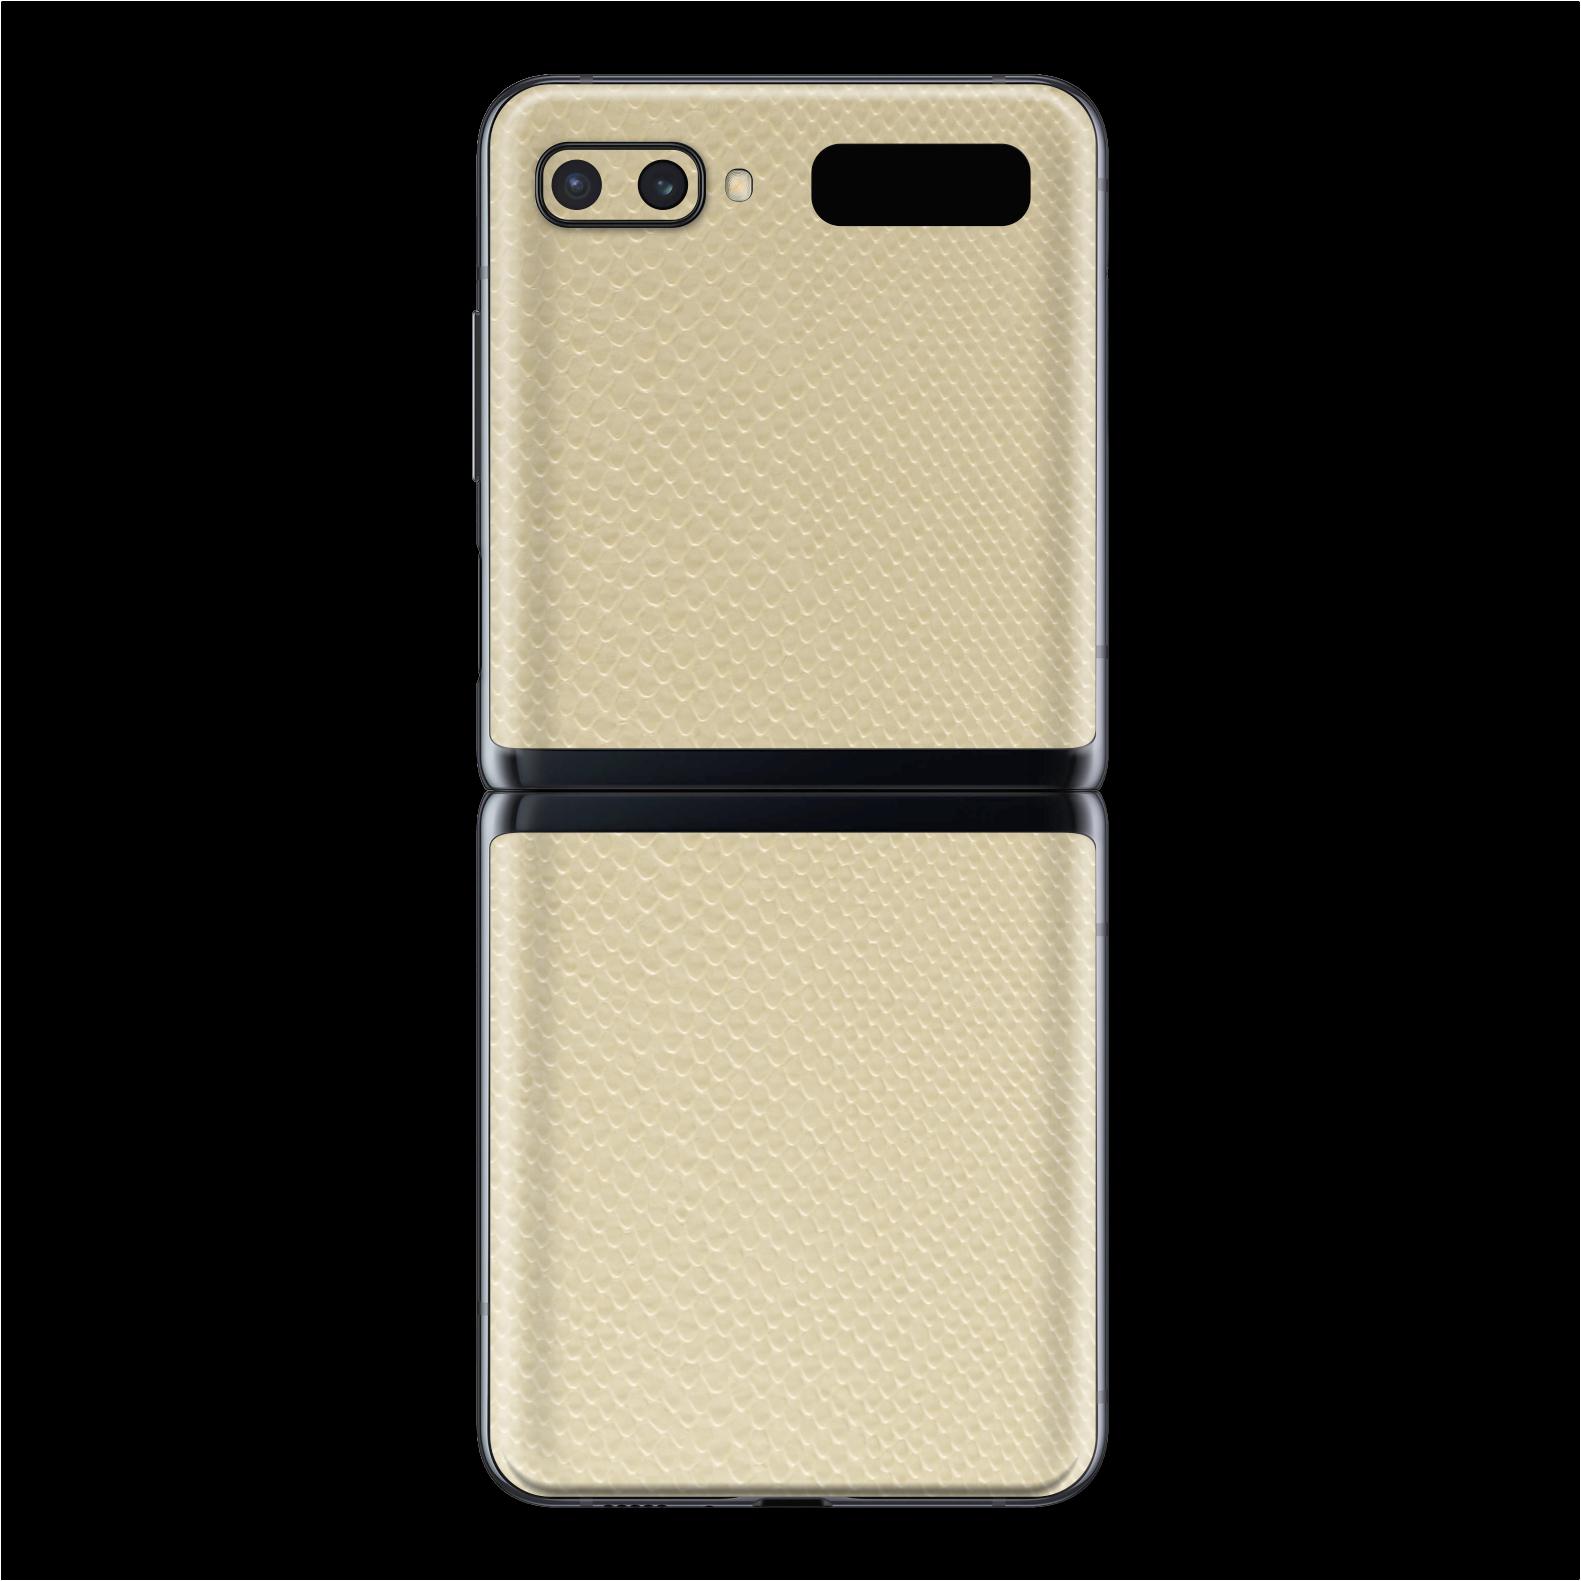 Samsung Galaxy Z Flip BEIGE MAMBA Snake Skin